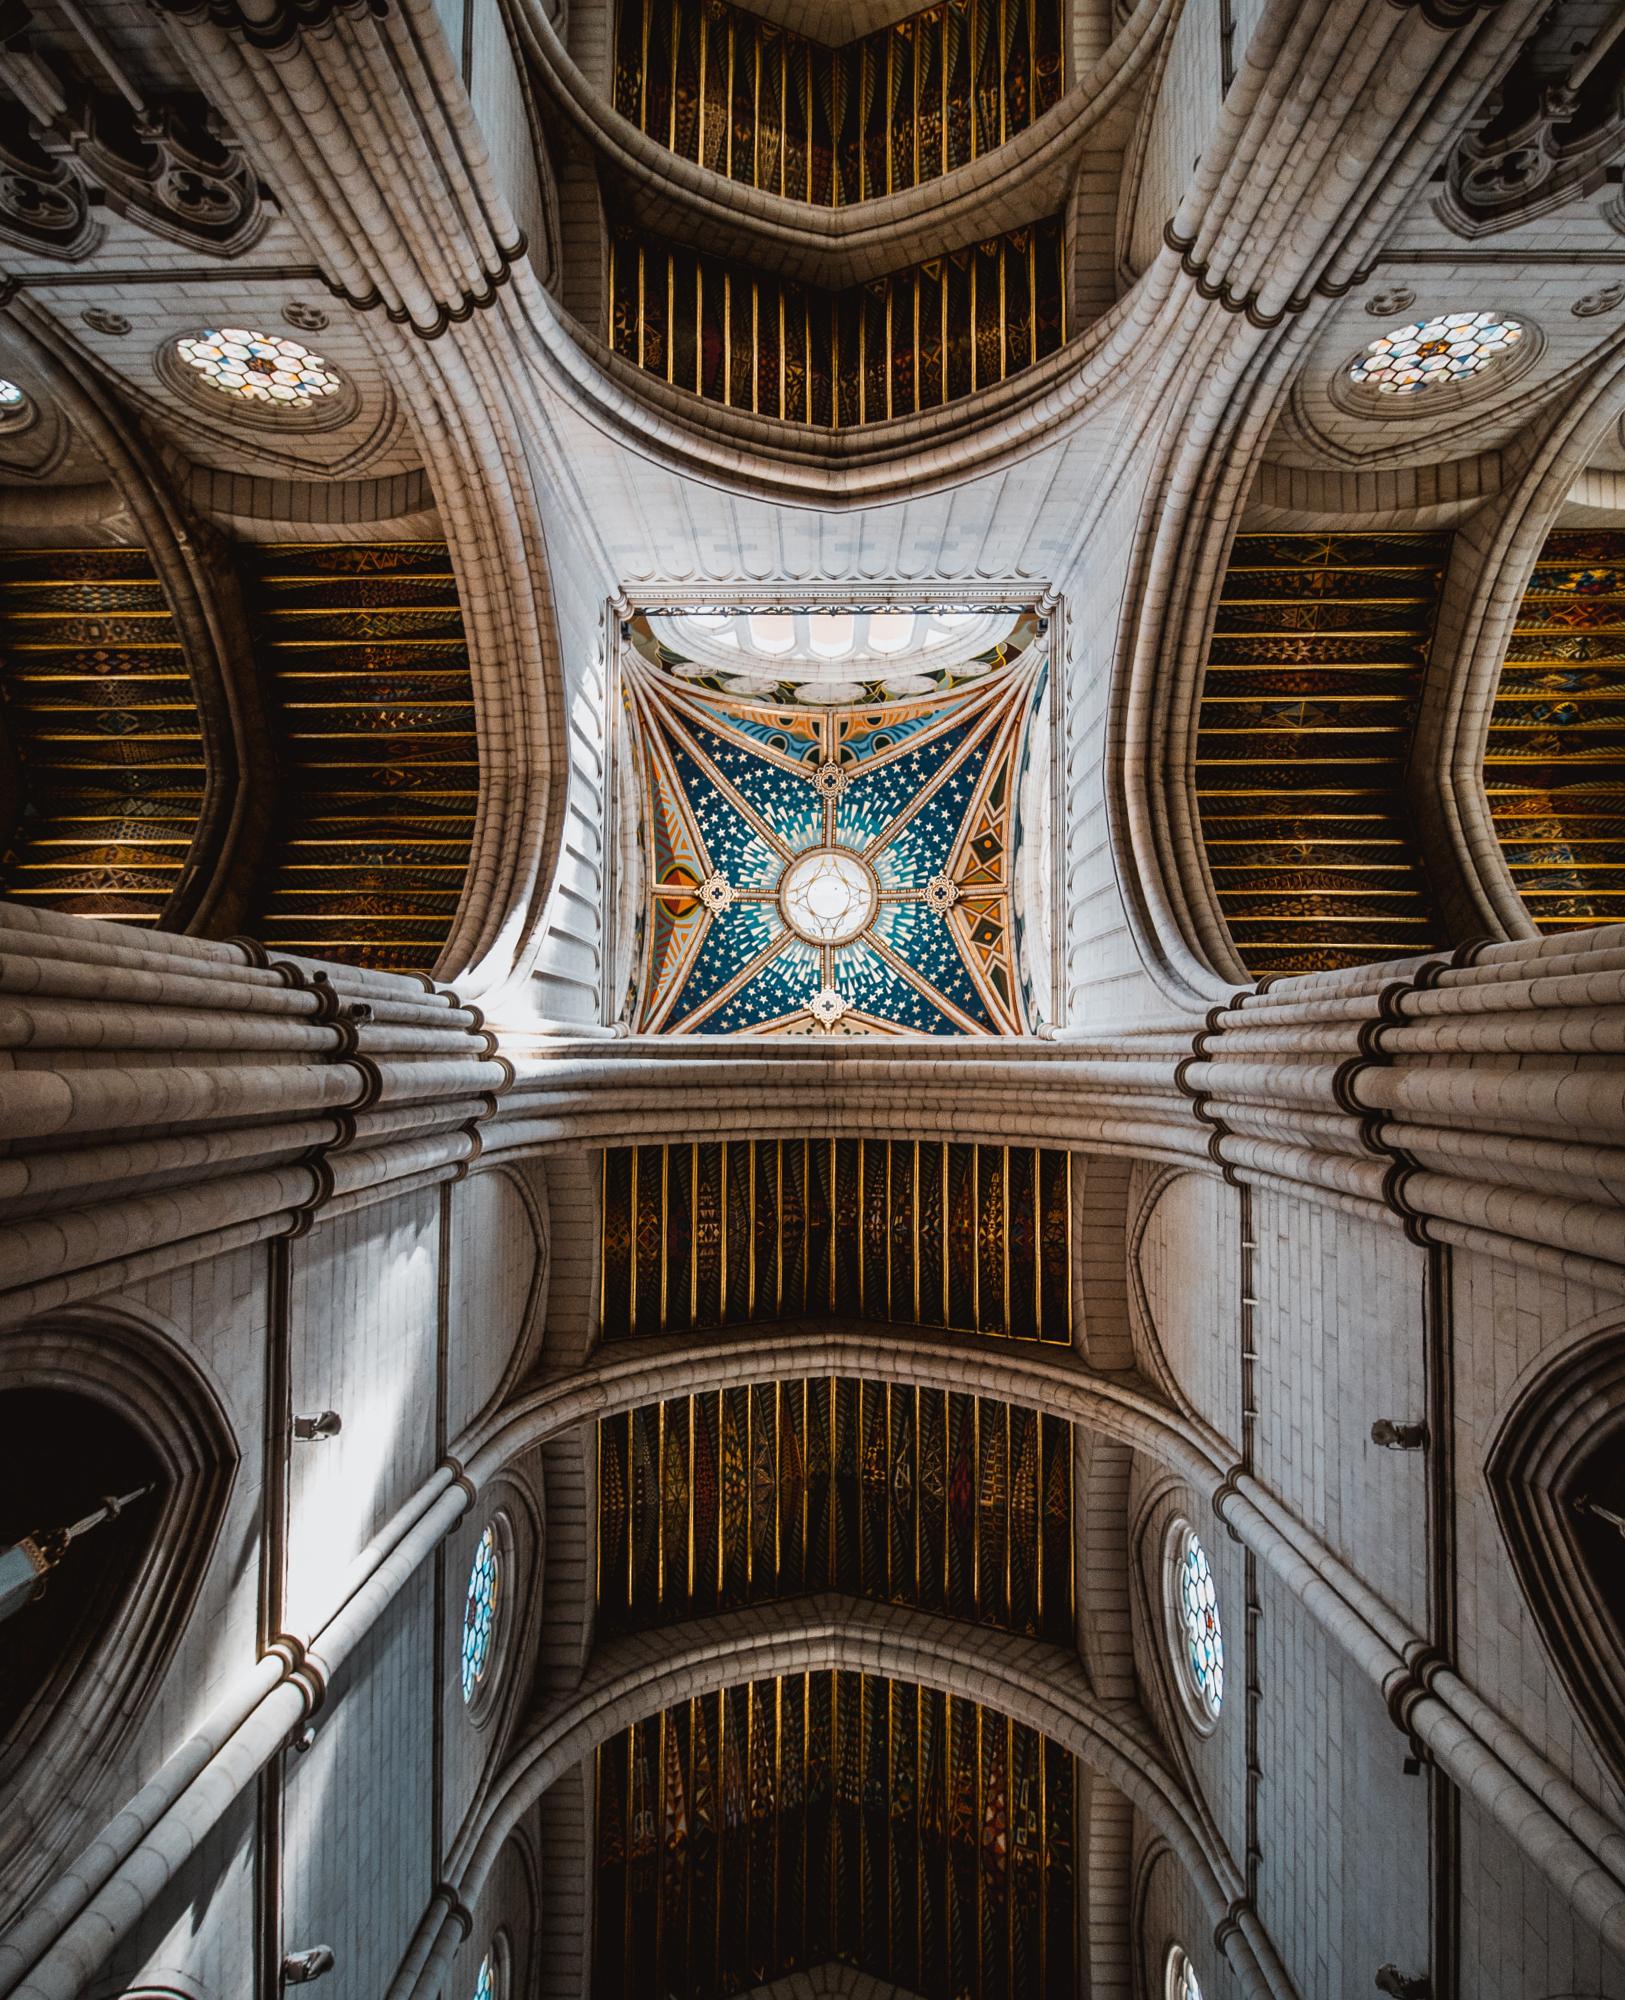 Eglise catholique du canton de Fribourg - WNG Agence Digitale